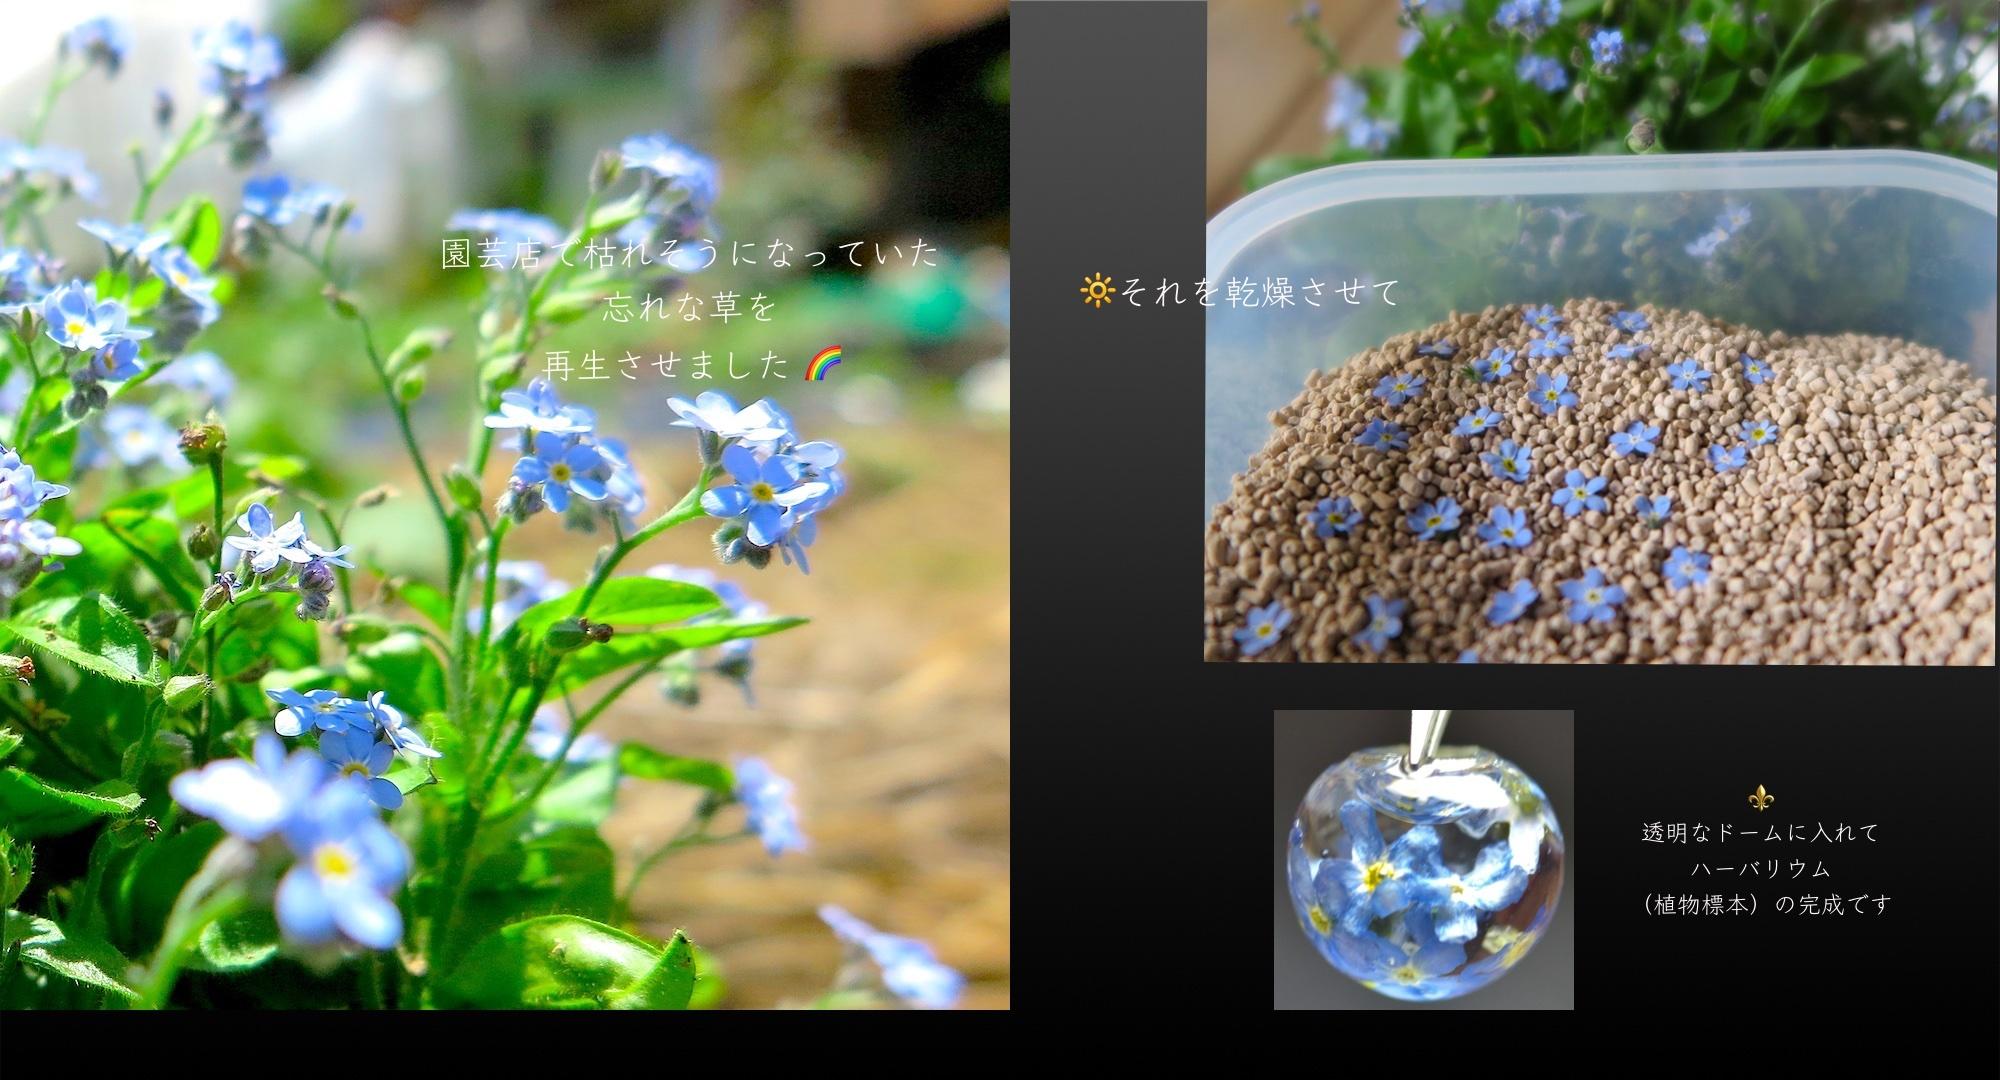 【14GDF】ハーバリウムネックレス *Eternal Love...勿忘草と3つの石の物語Vol.2*